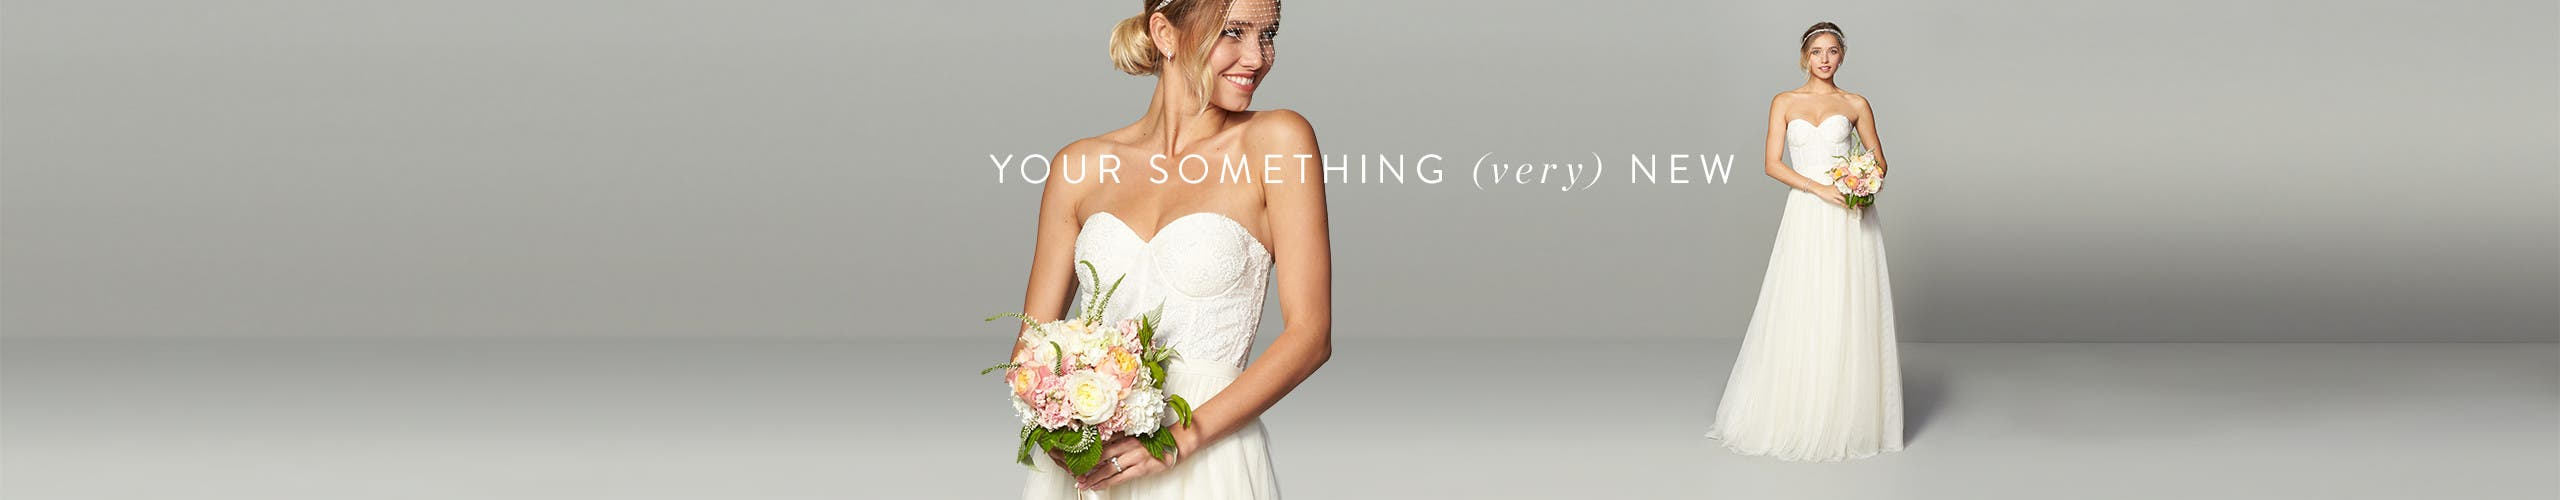 Your Something Very New: modern wedding dresses.